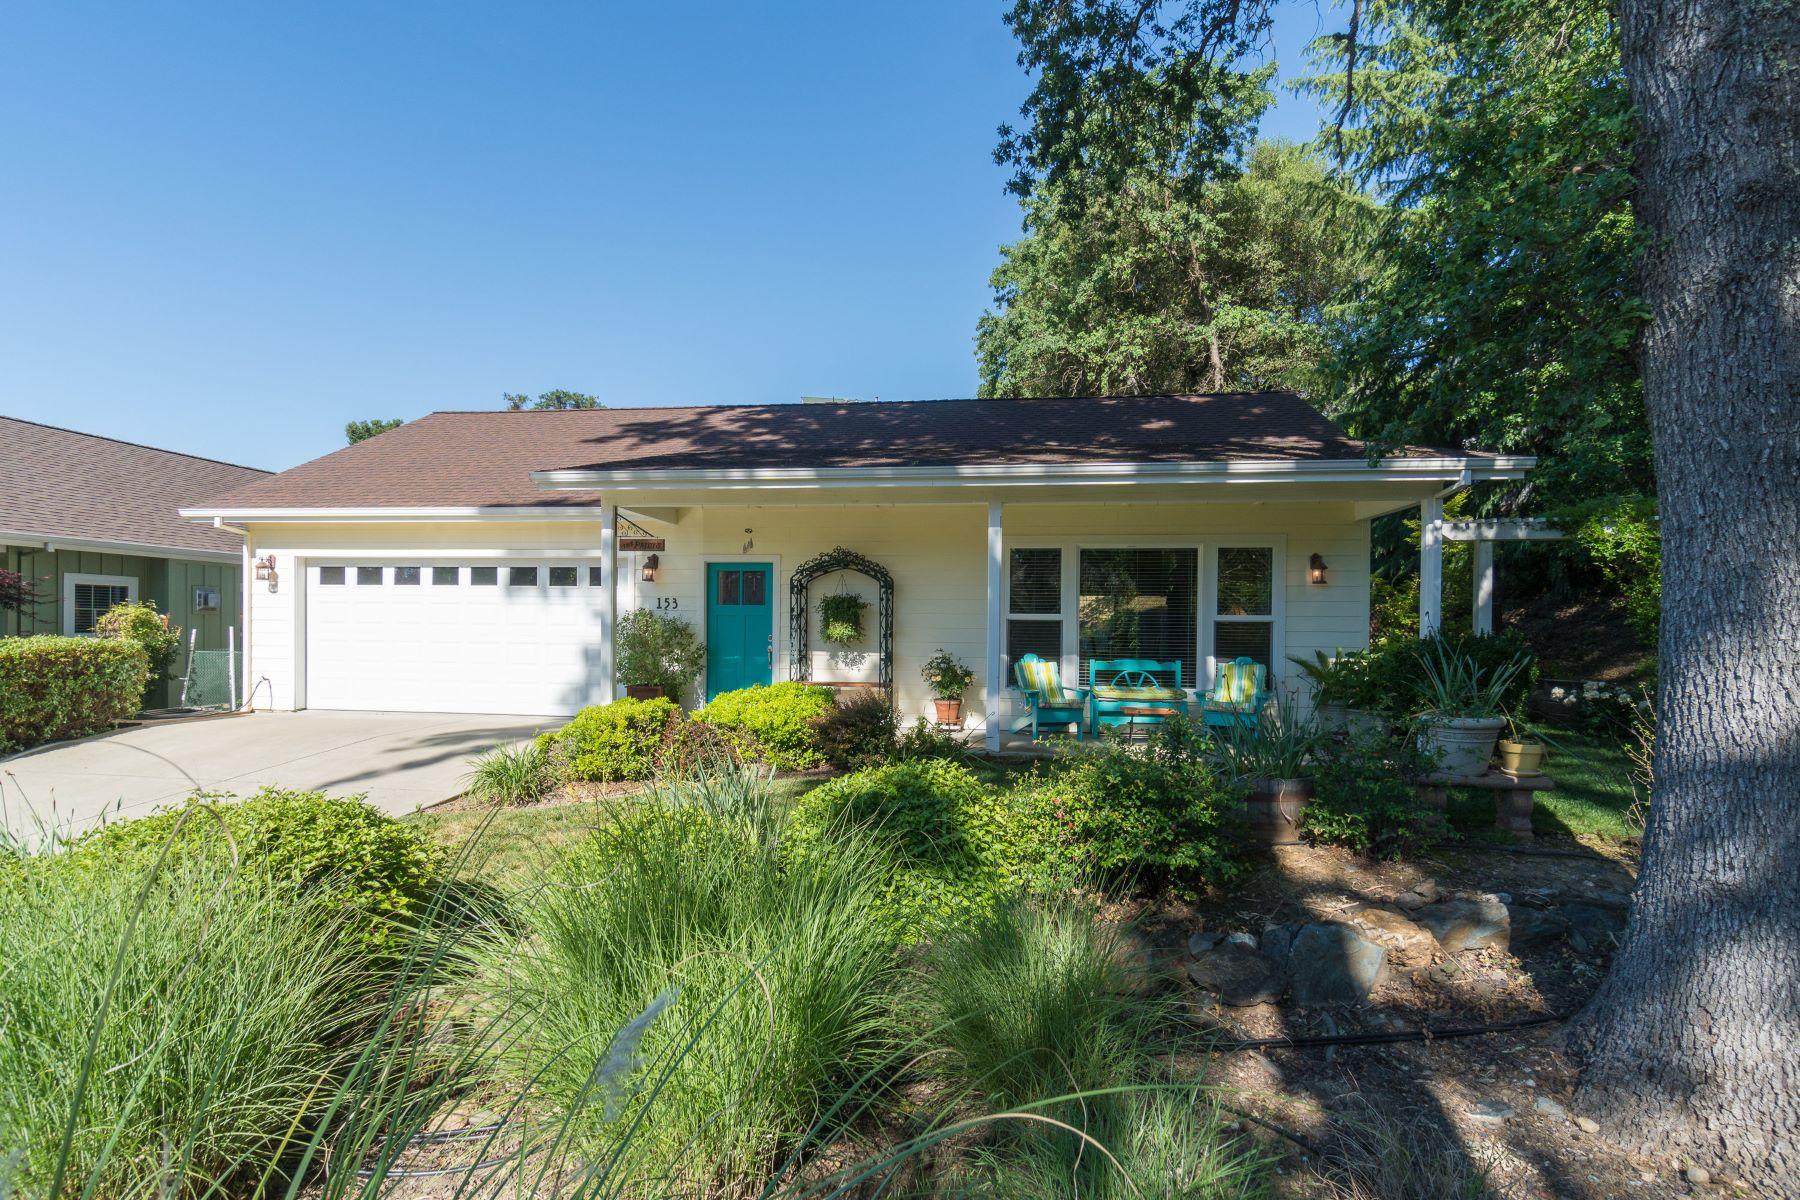 Single Family Home for Sale at 153 Village Court, Jackson Jackson, California 95642 United States